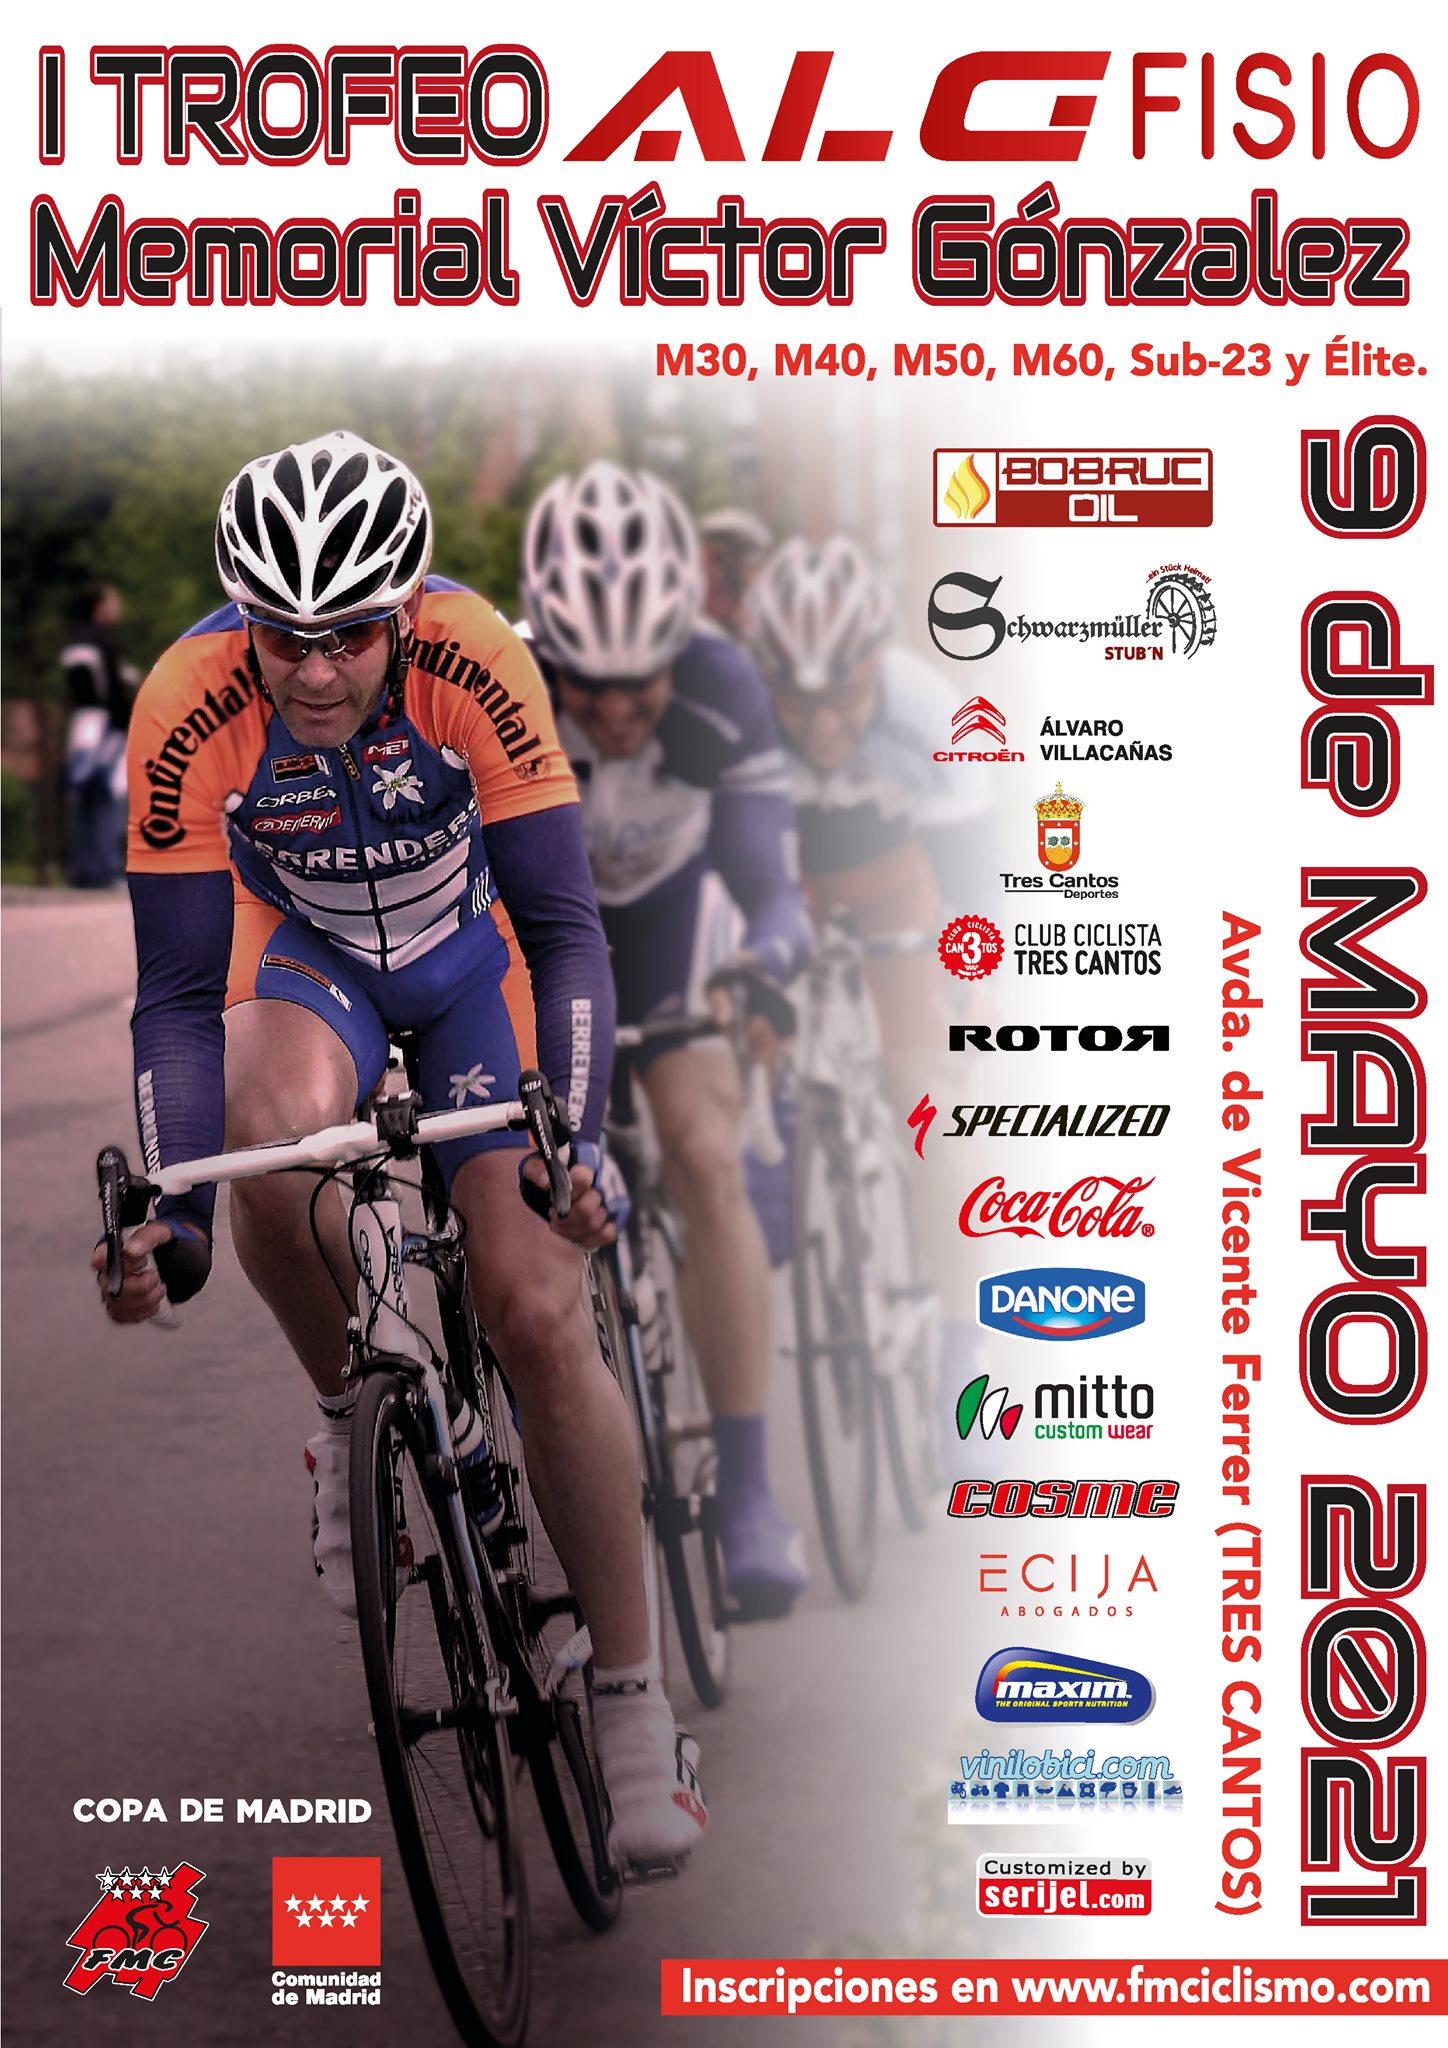 Trofeo ALG Fisio